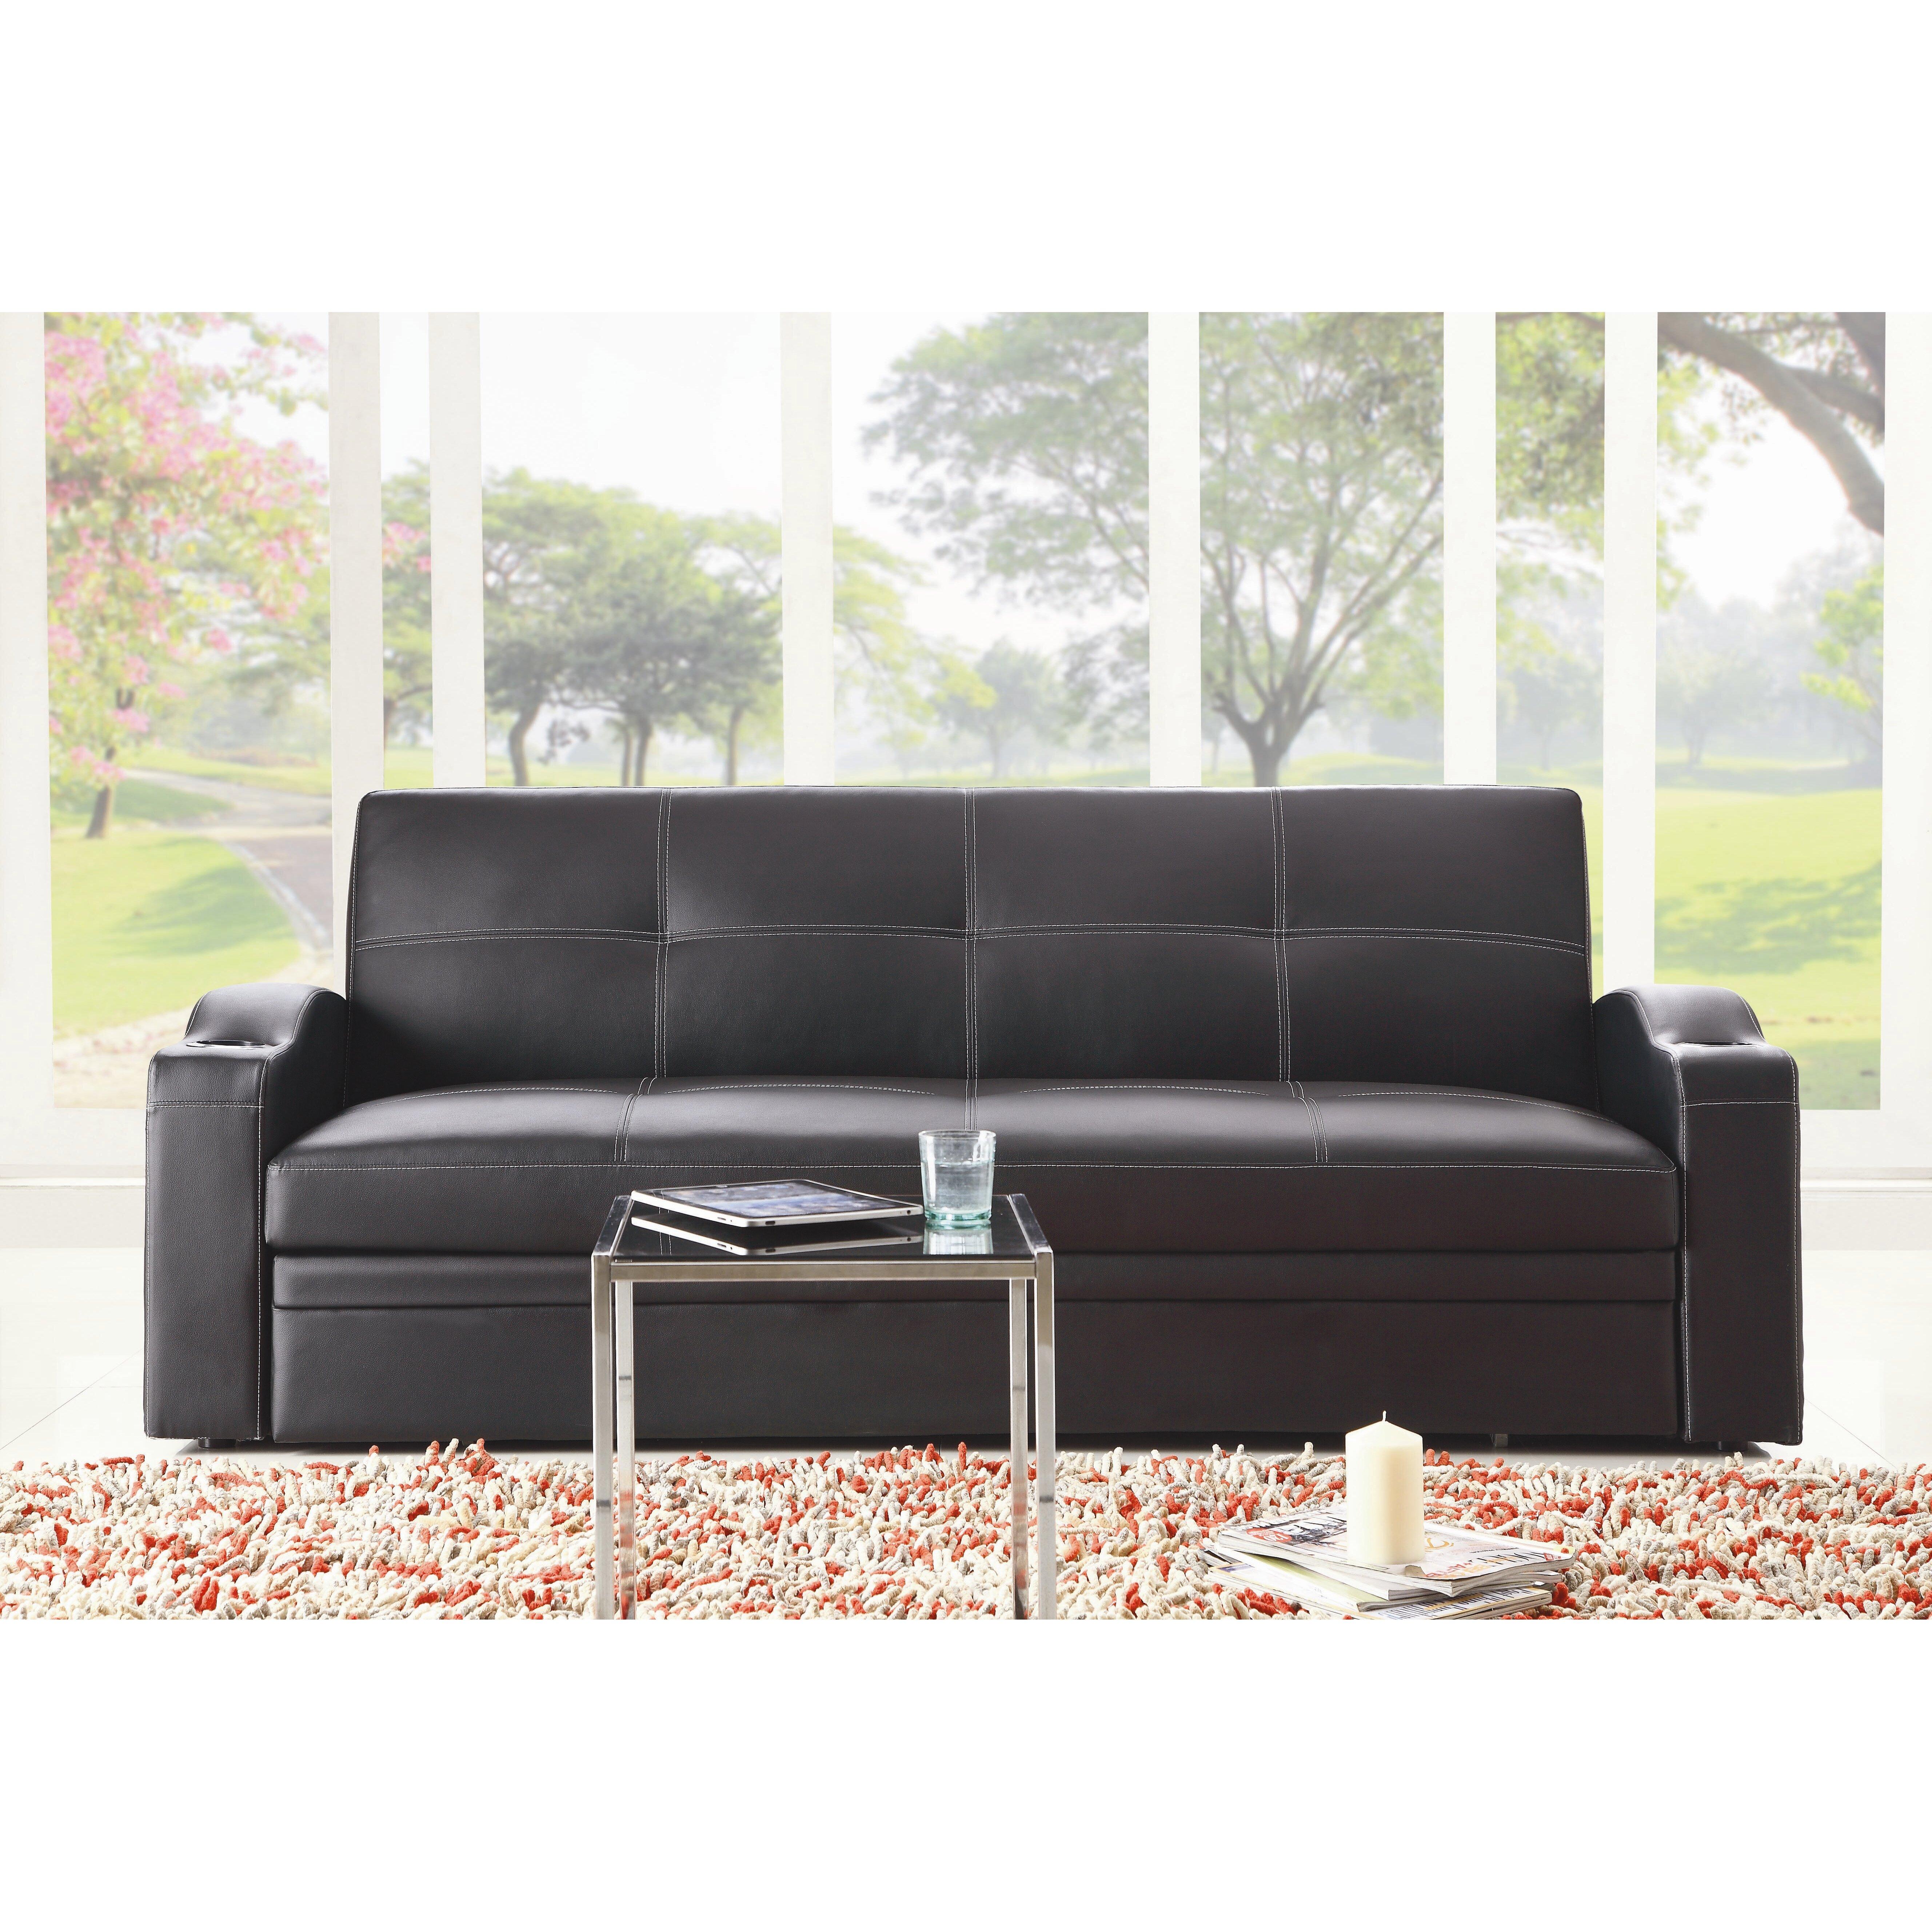 Woodhaven Living Room Furniture Woodhaven Hill Novak Sleeper Sofa Reviews Wayfair